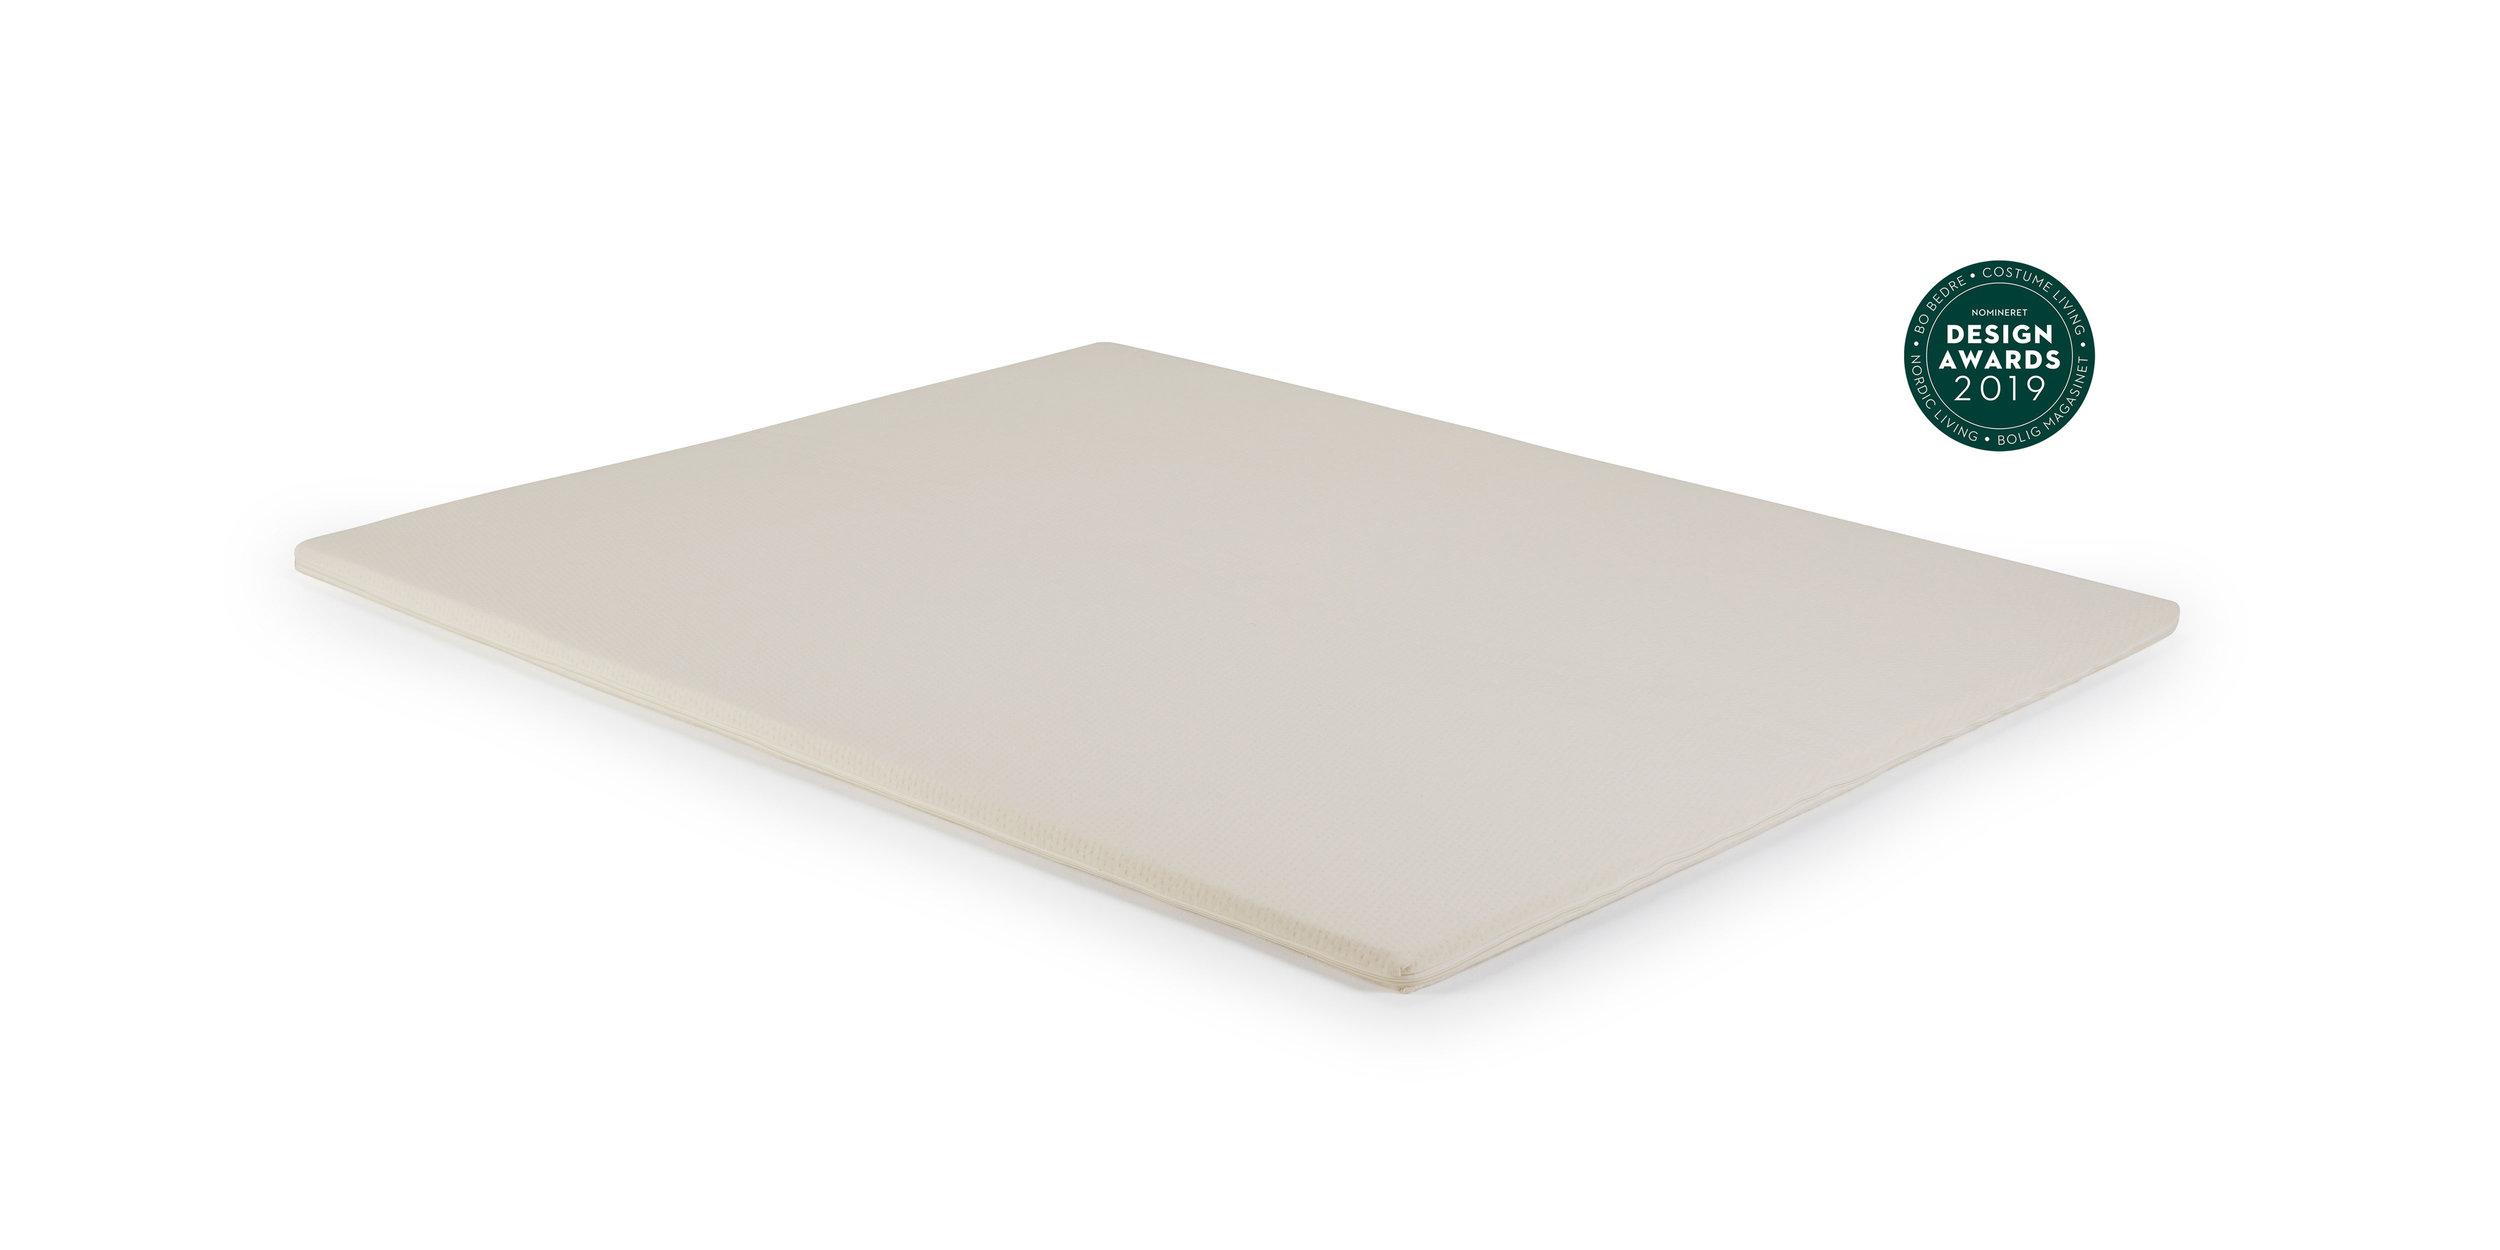 re-mattress-topper-classic-1DAW1.jpg